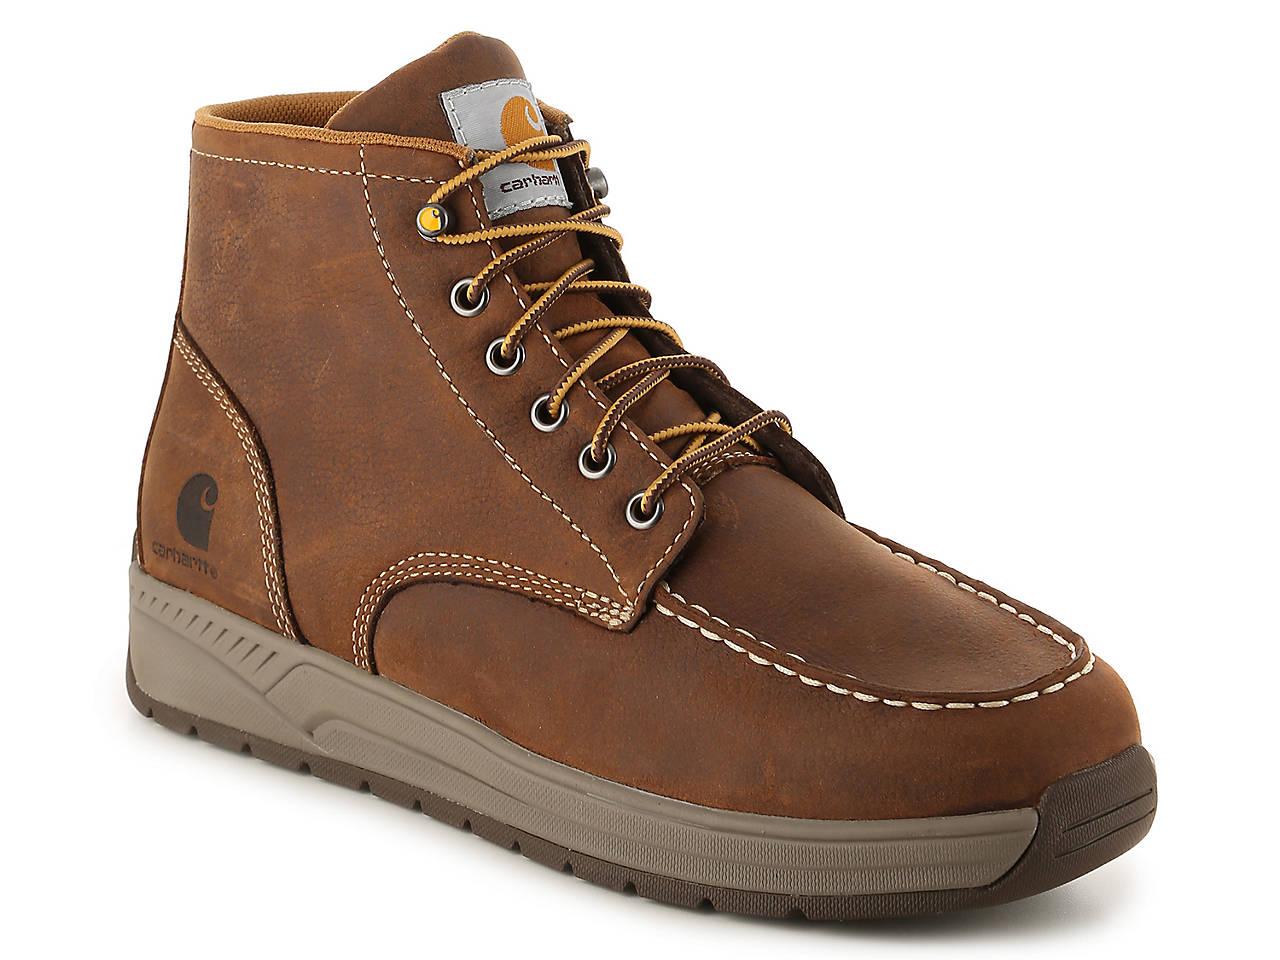 a8c49957a18 Moc Toe Work Boot